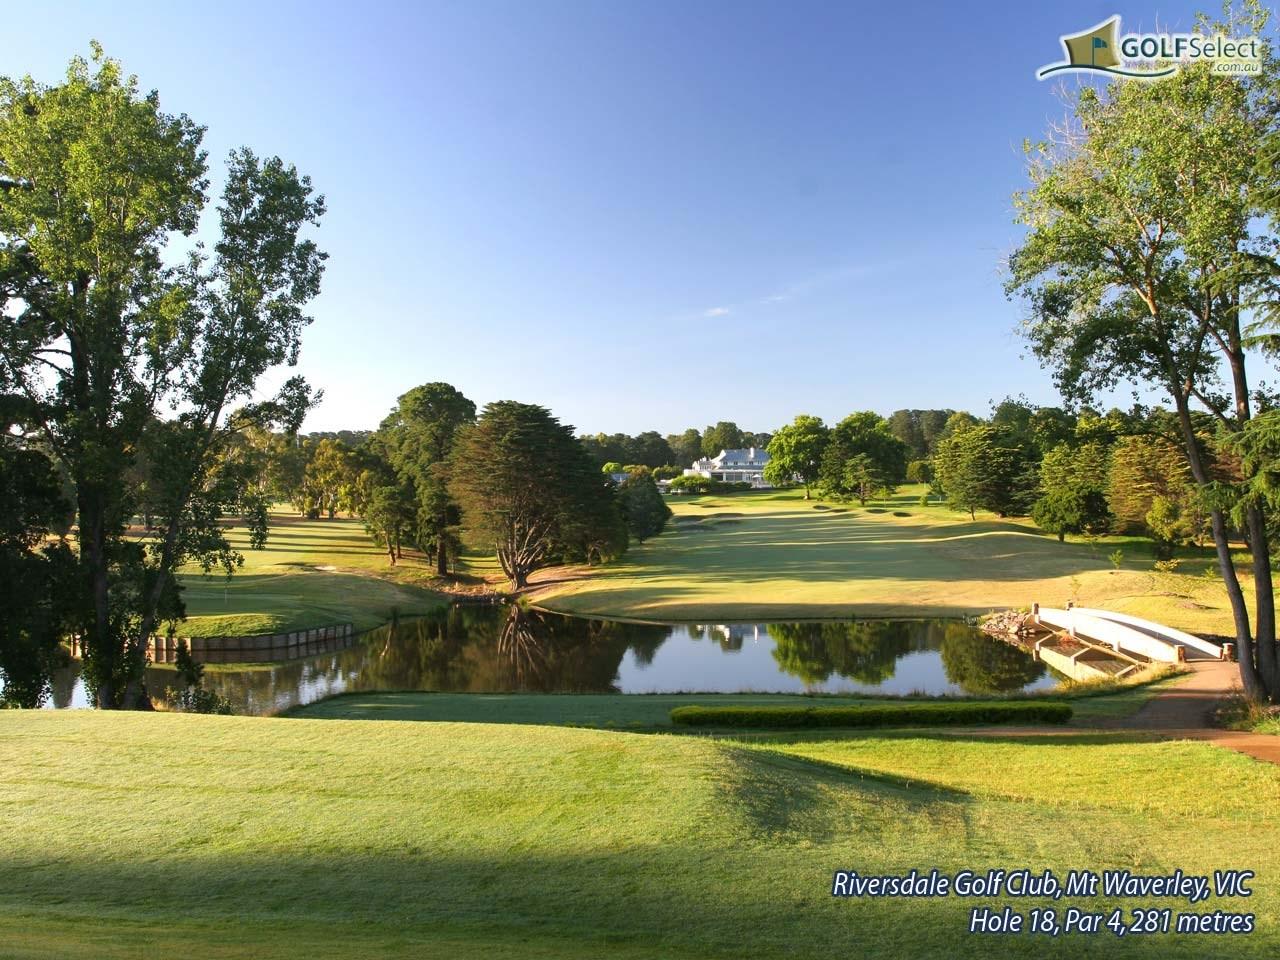 riversdale golf club mt waverley victoria 3149 golfselect. Black Bedroom Furniture Sets. Home Design Ideas